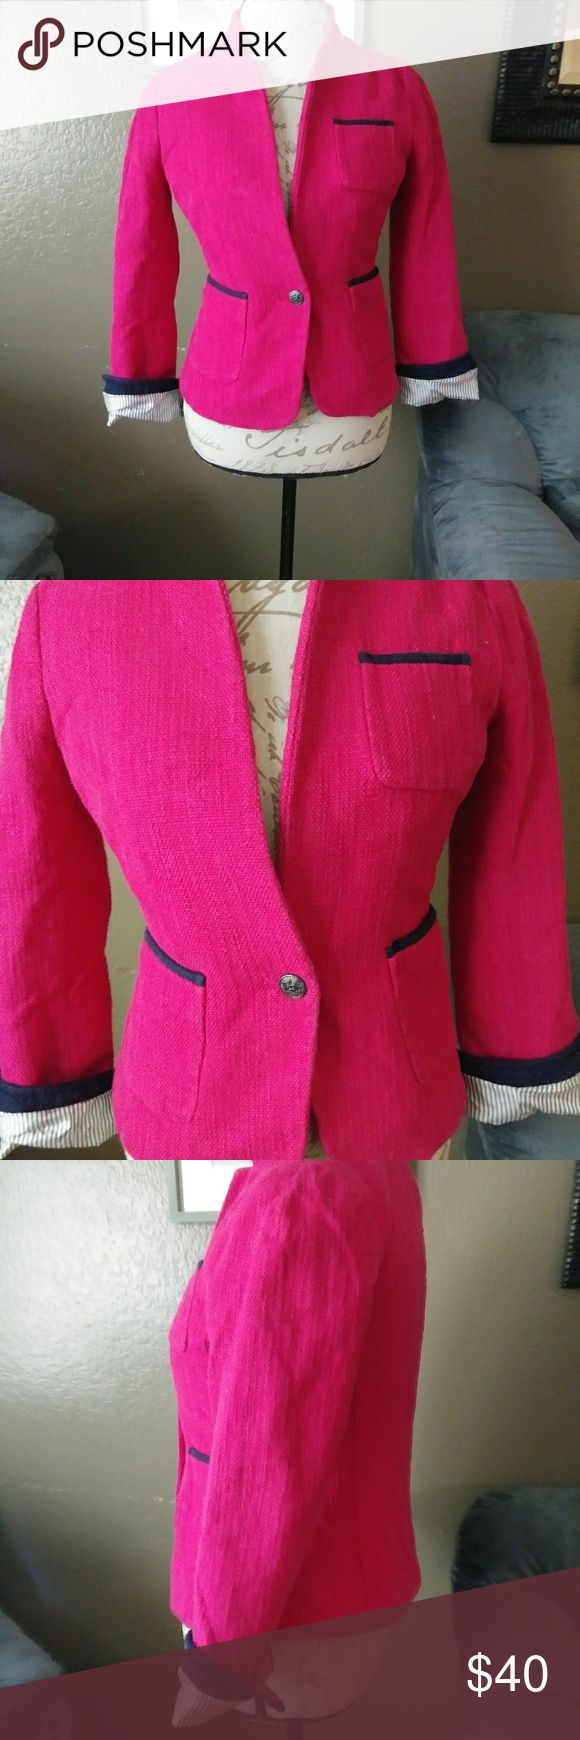 Hot pink blazer In good condition Banana Republic Jackets & Coats Blazers